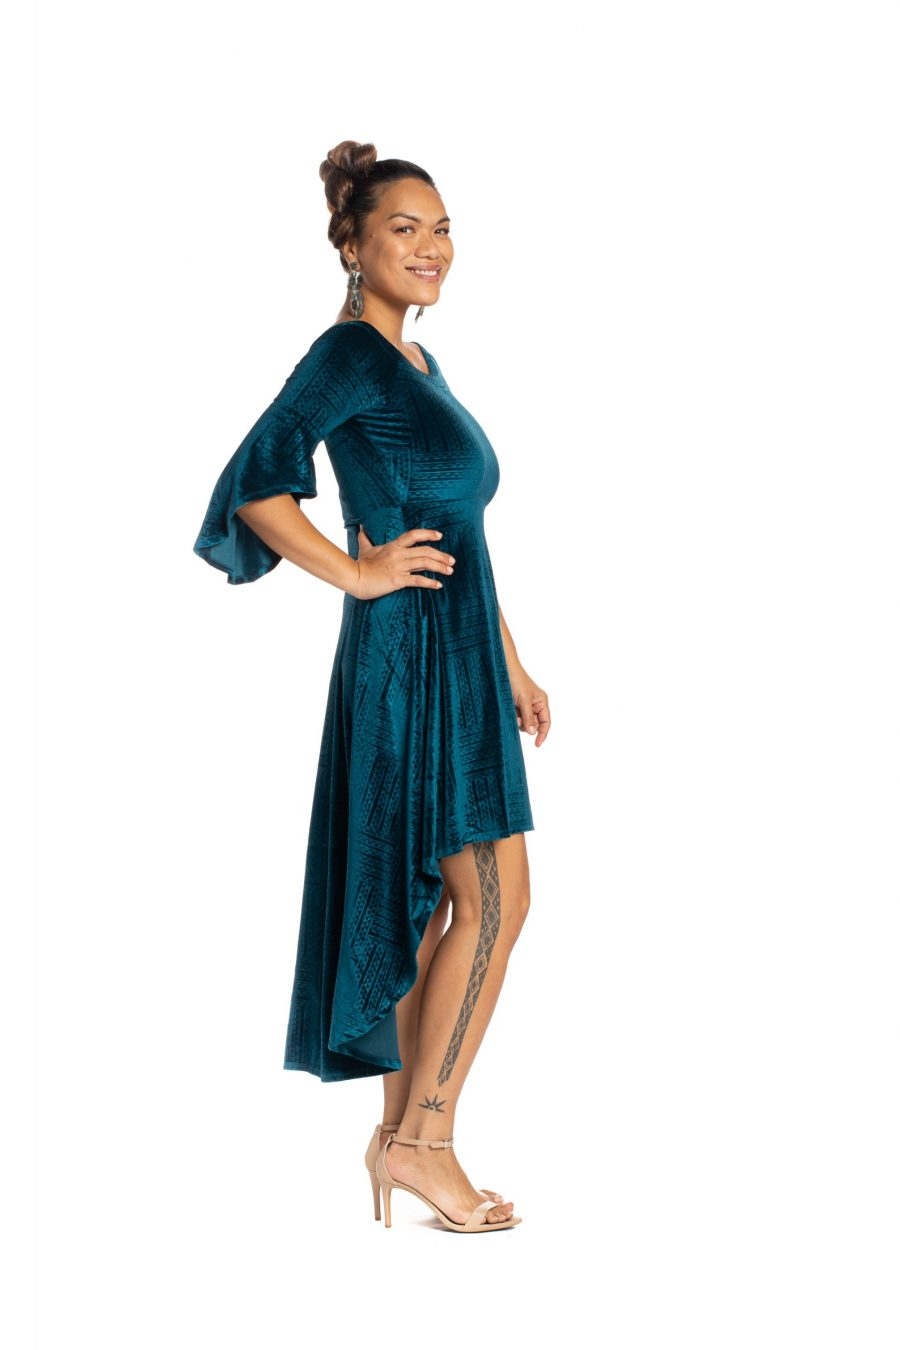 Model wearing Melia Dress in Peacock Teal Ulana Pattern- Side View